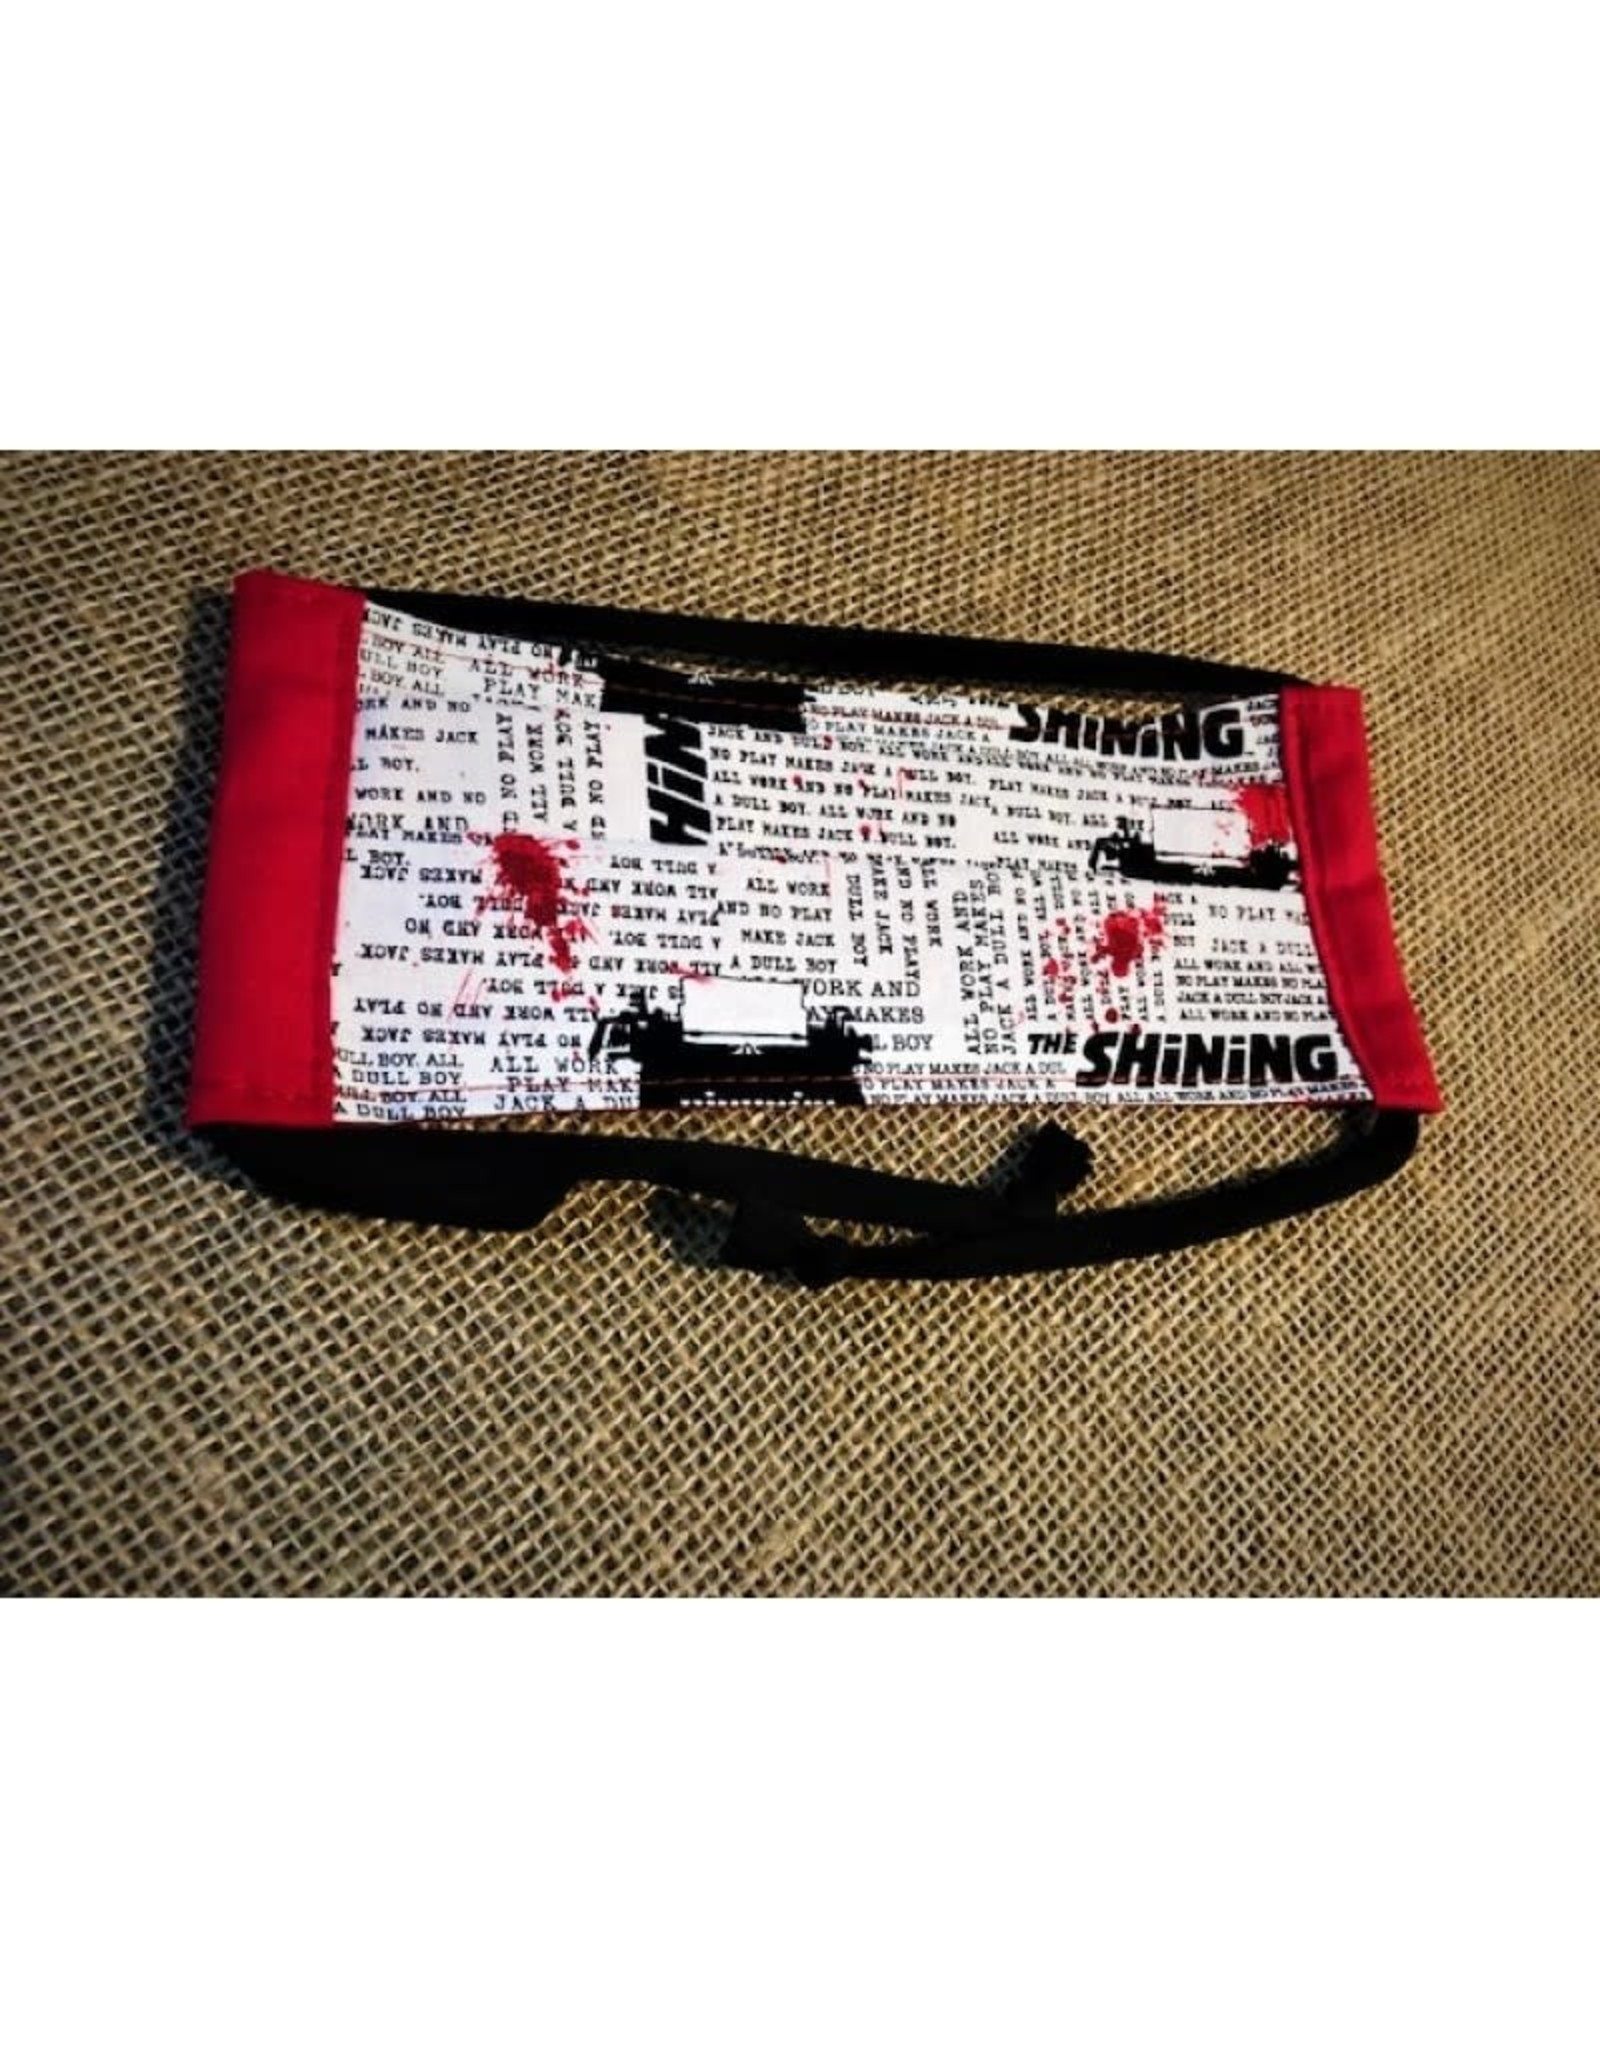 Bear Den Handmade Cotton Mask - The Shining